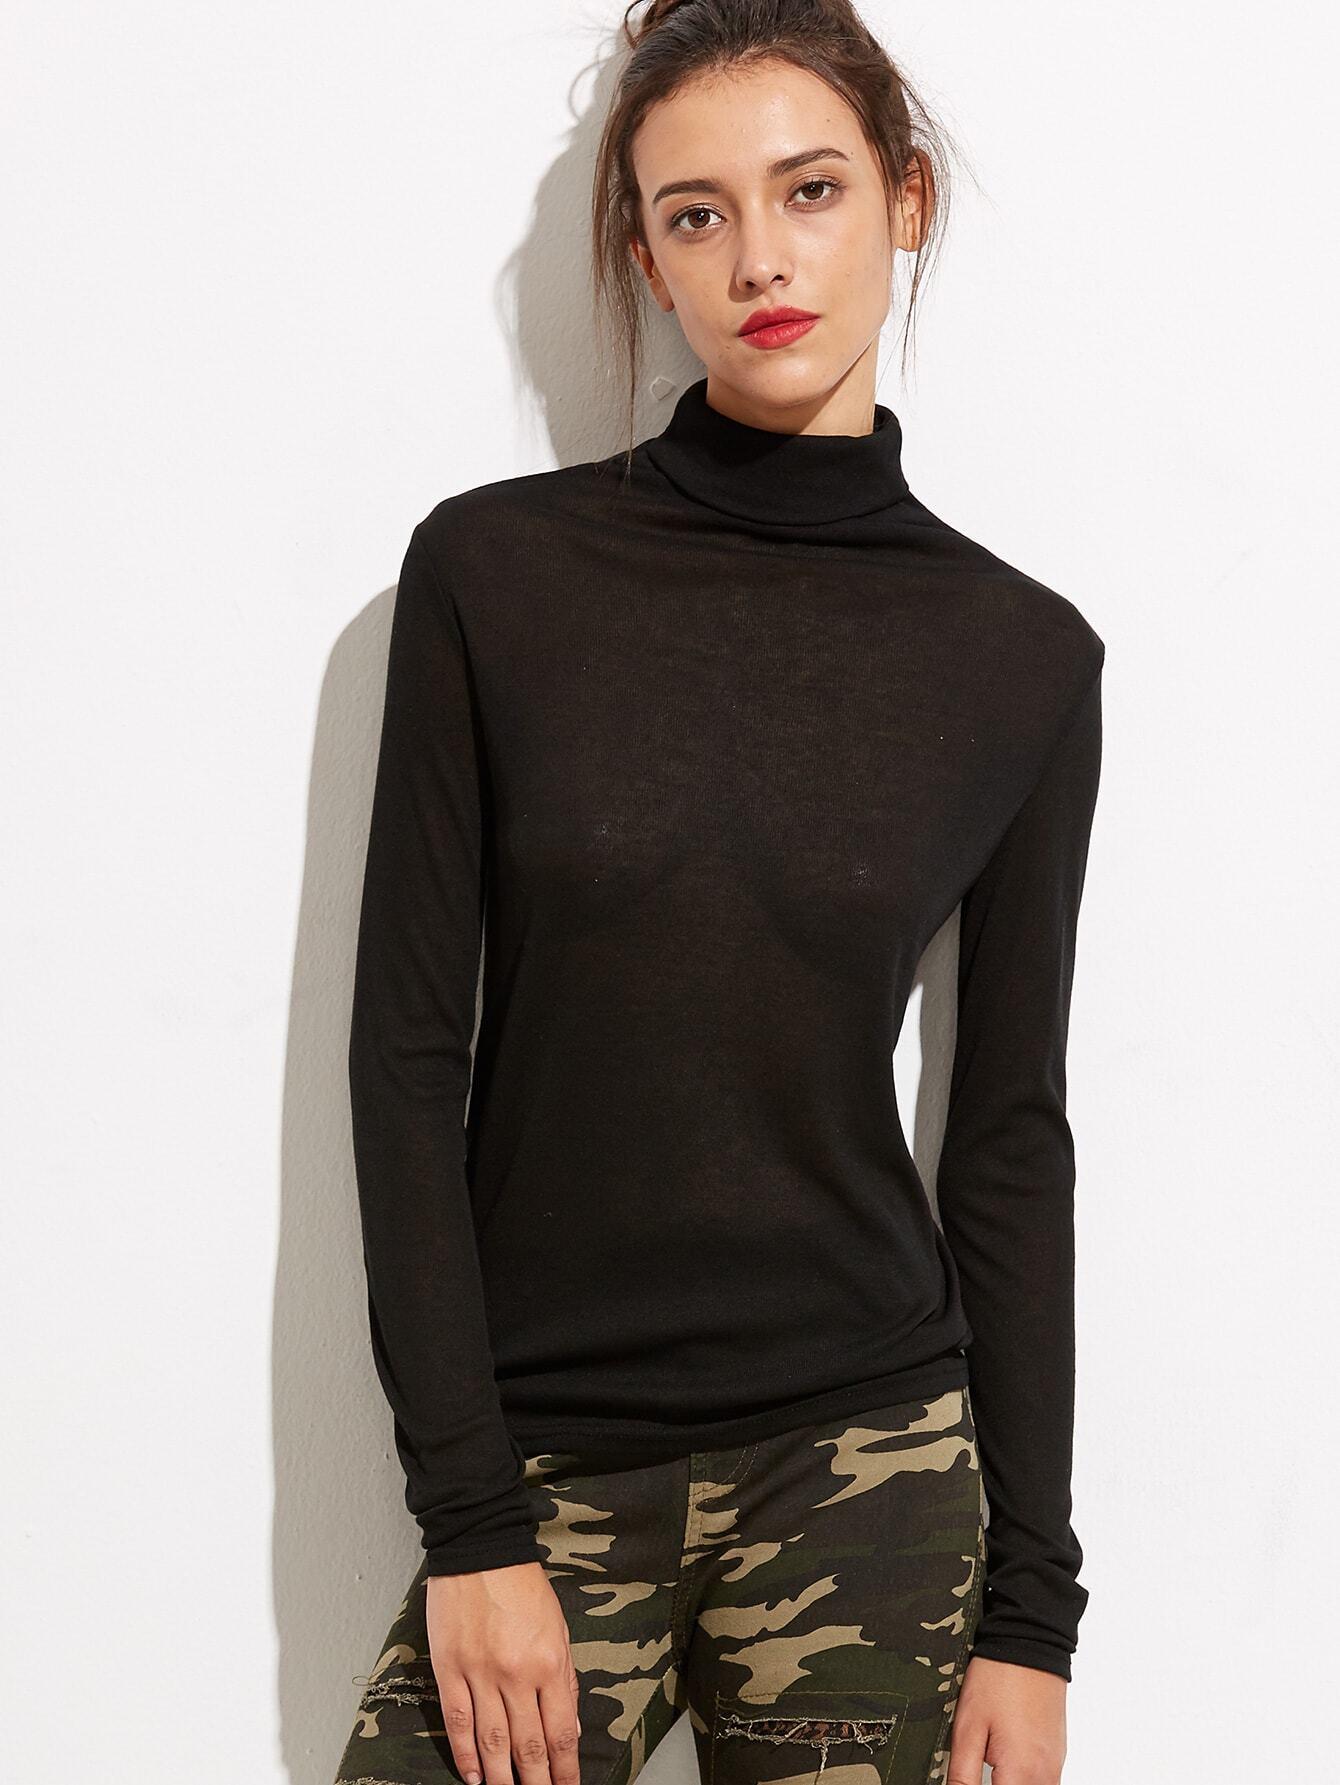 black turtleneck long sleeve t shirt